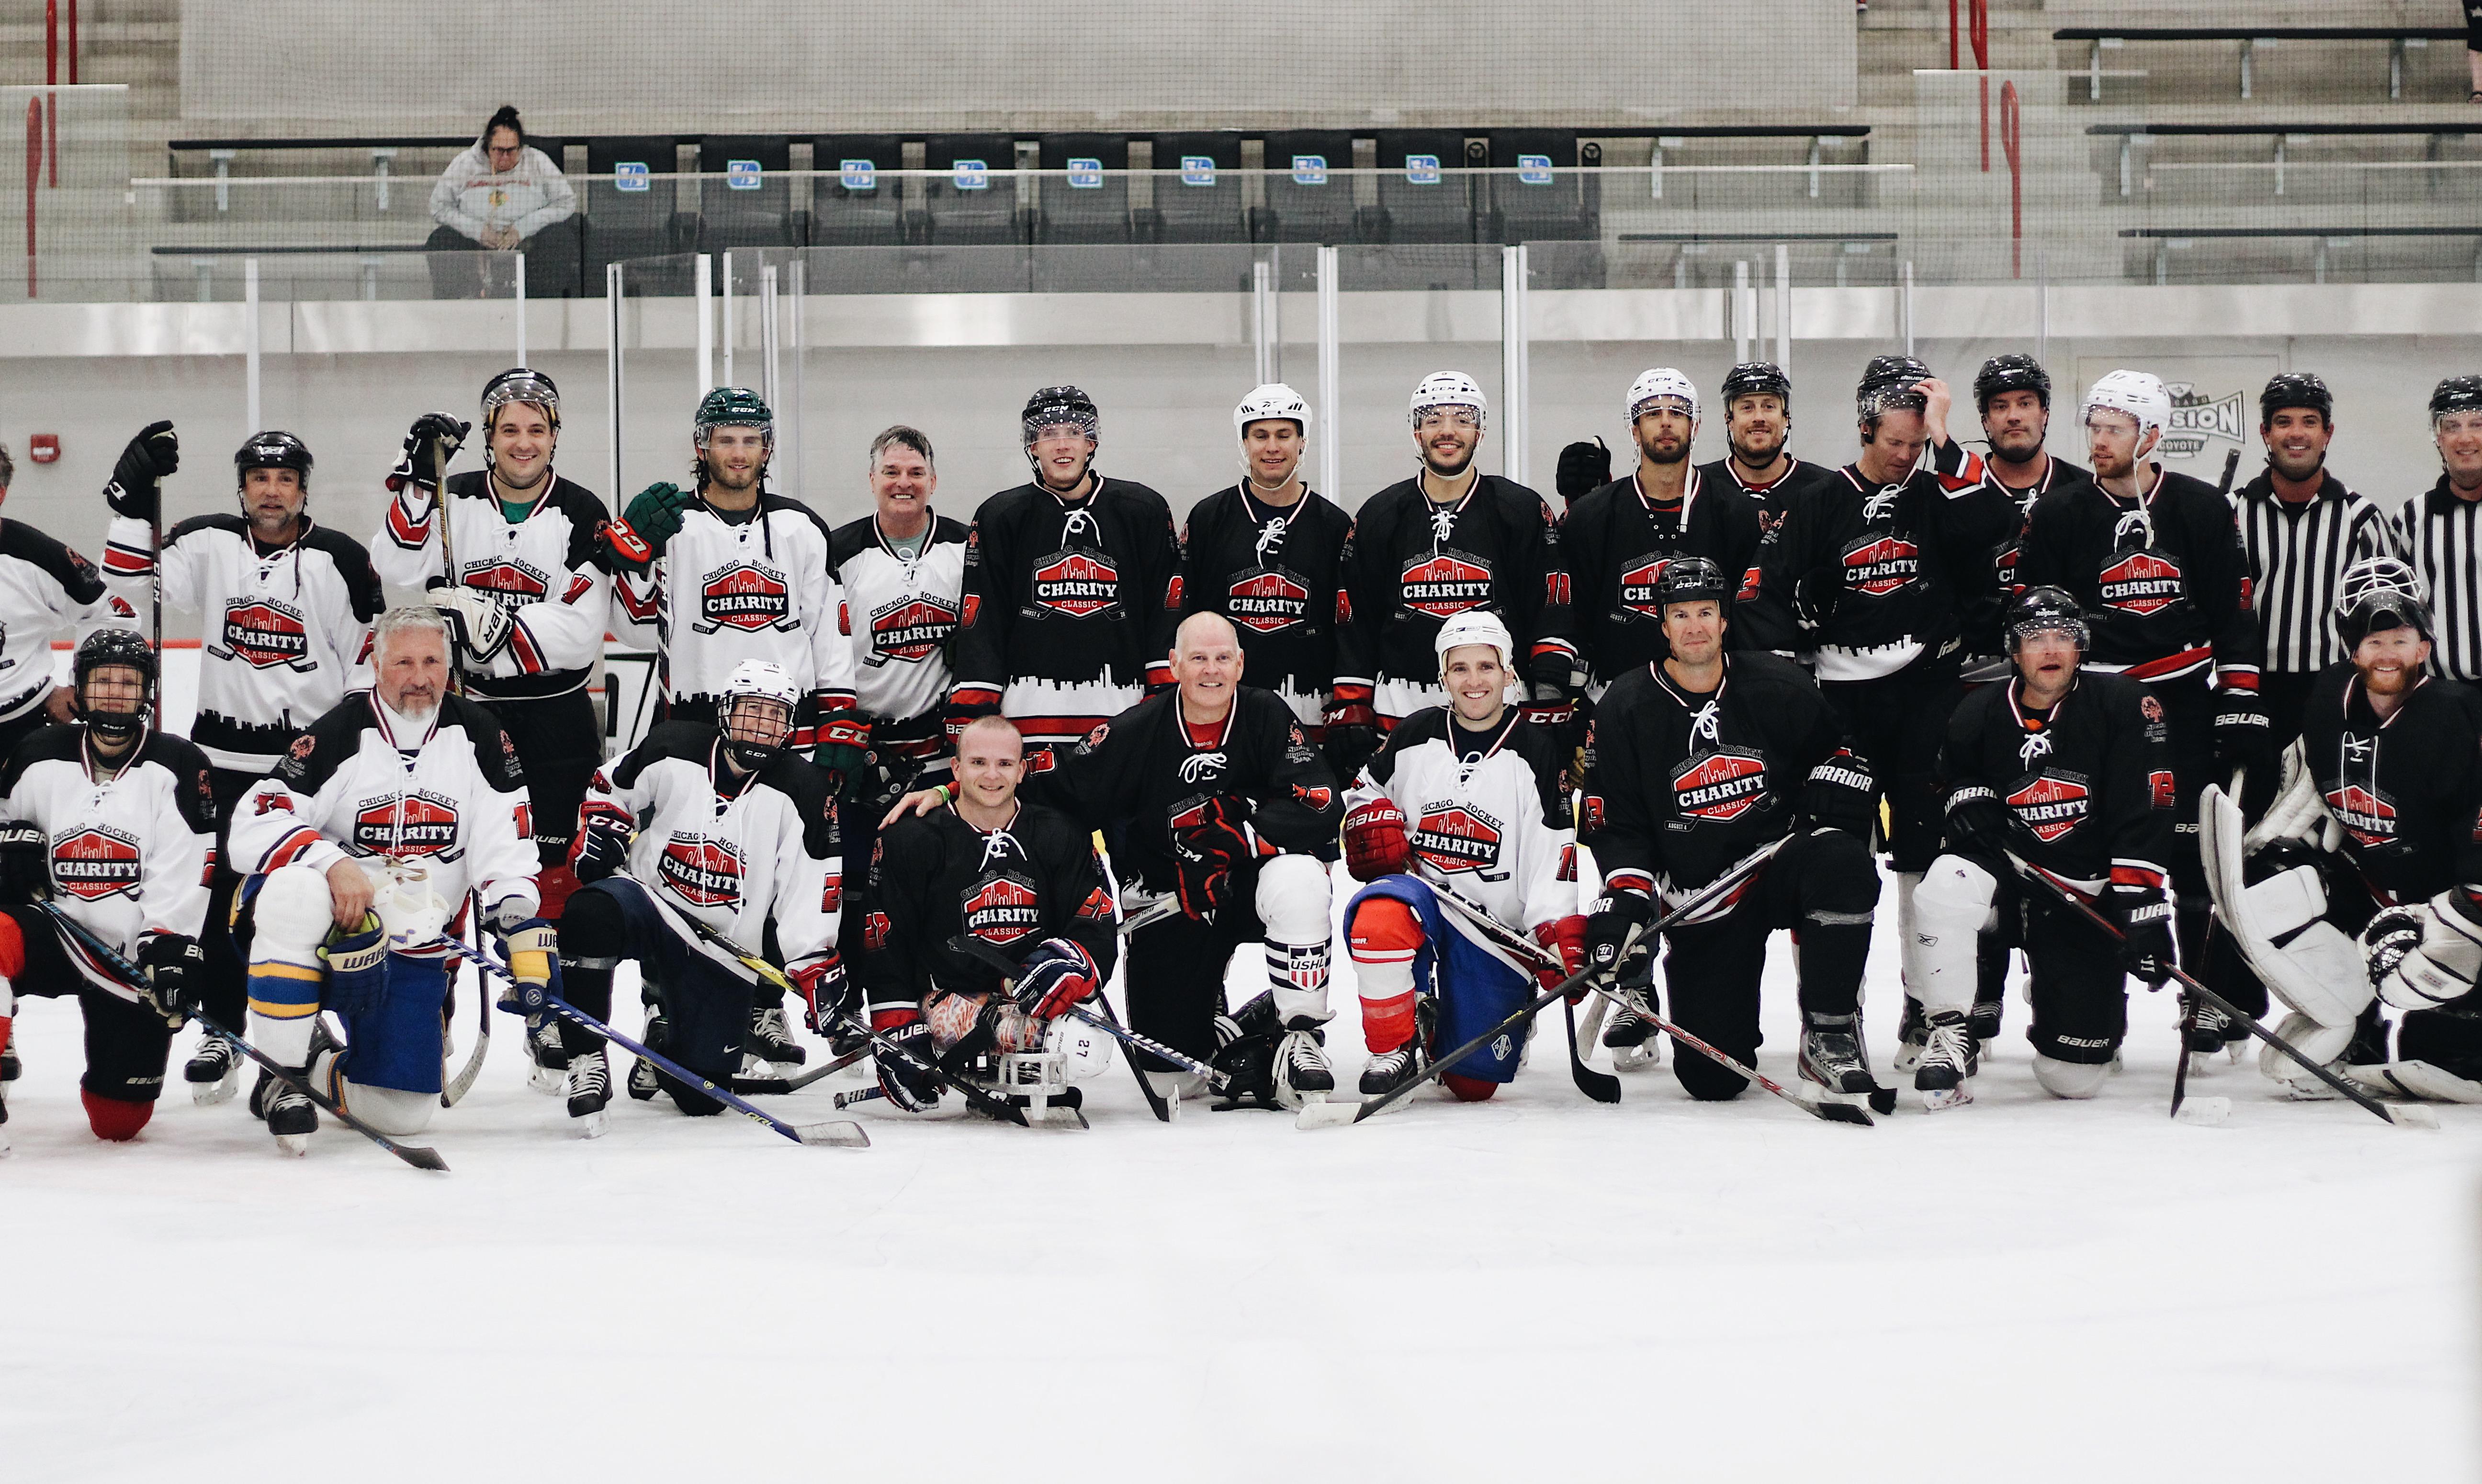 PHOTOS: Chicago Hockey Charity Classic 2019